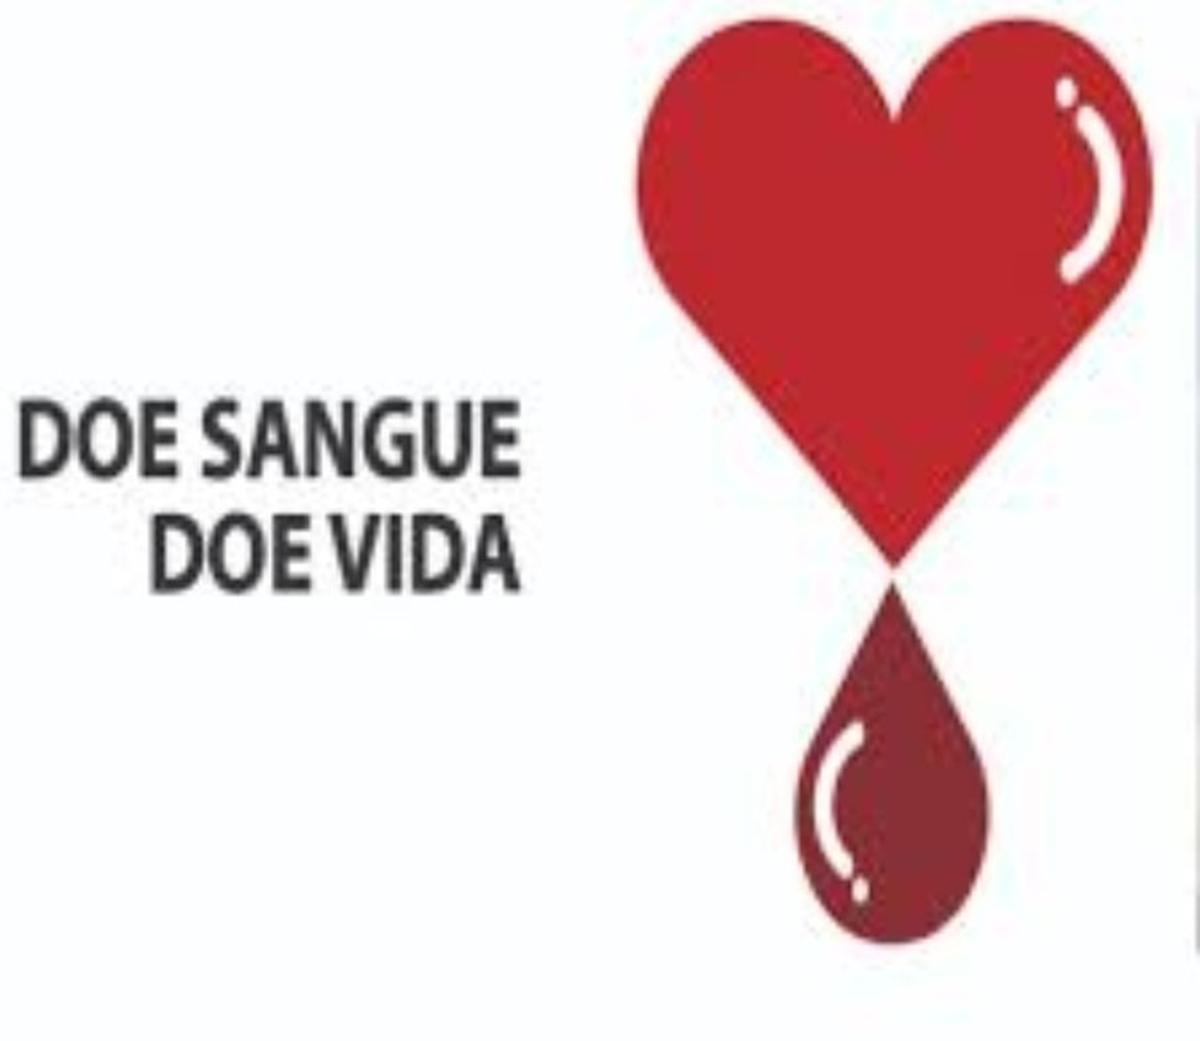 Doe Sangue e Medula